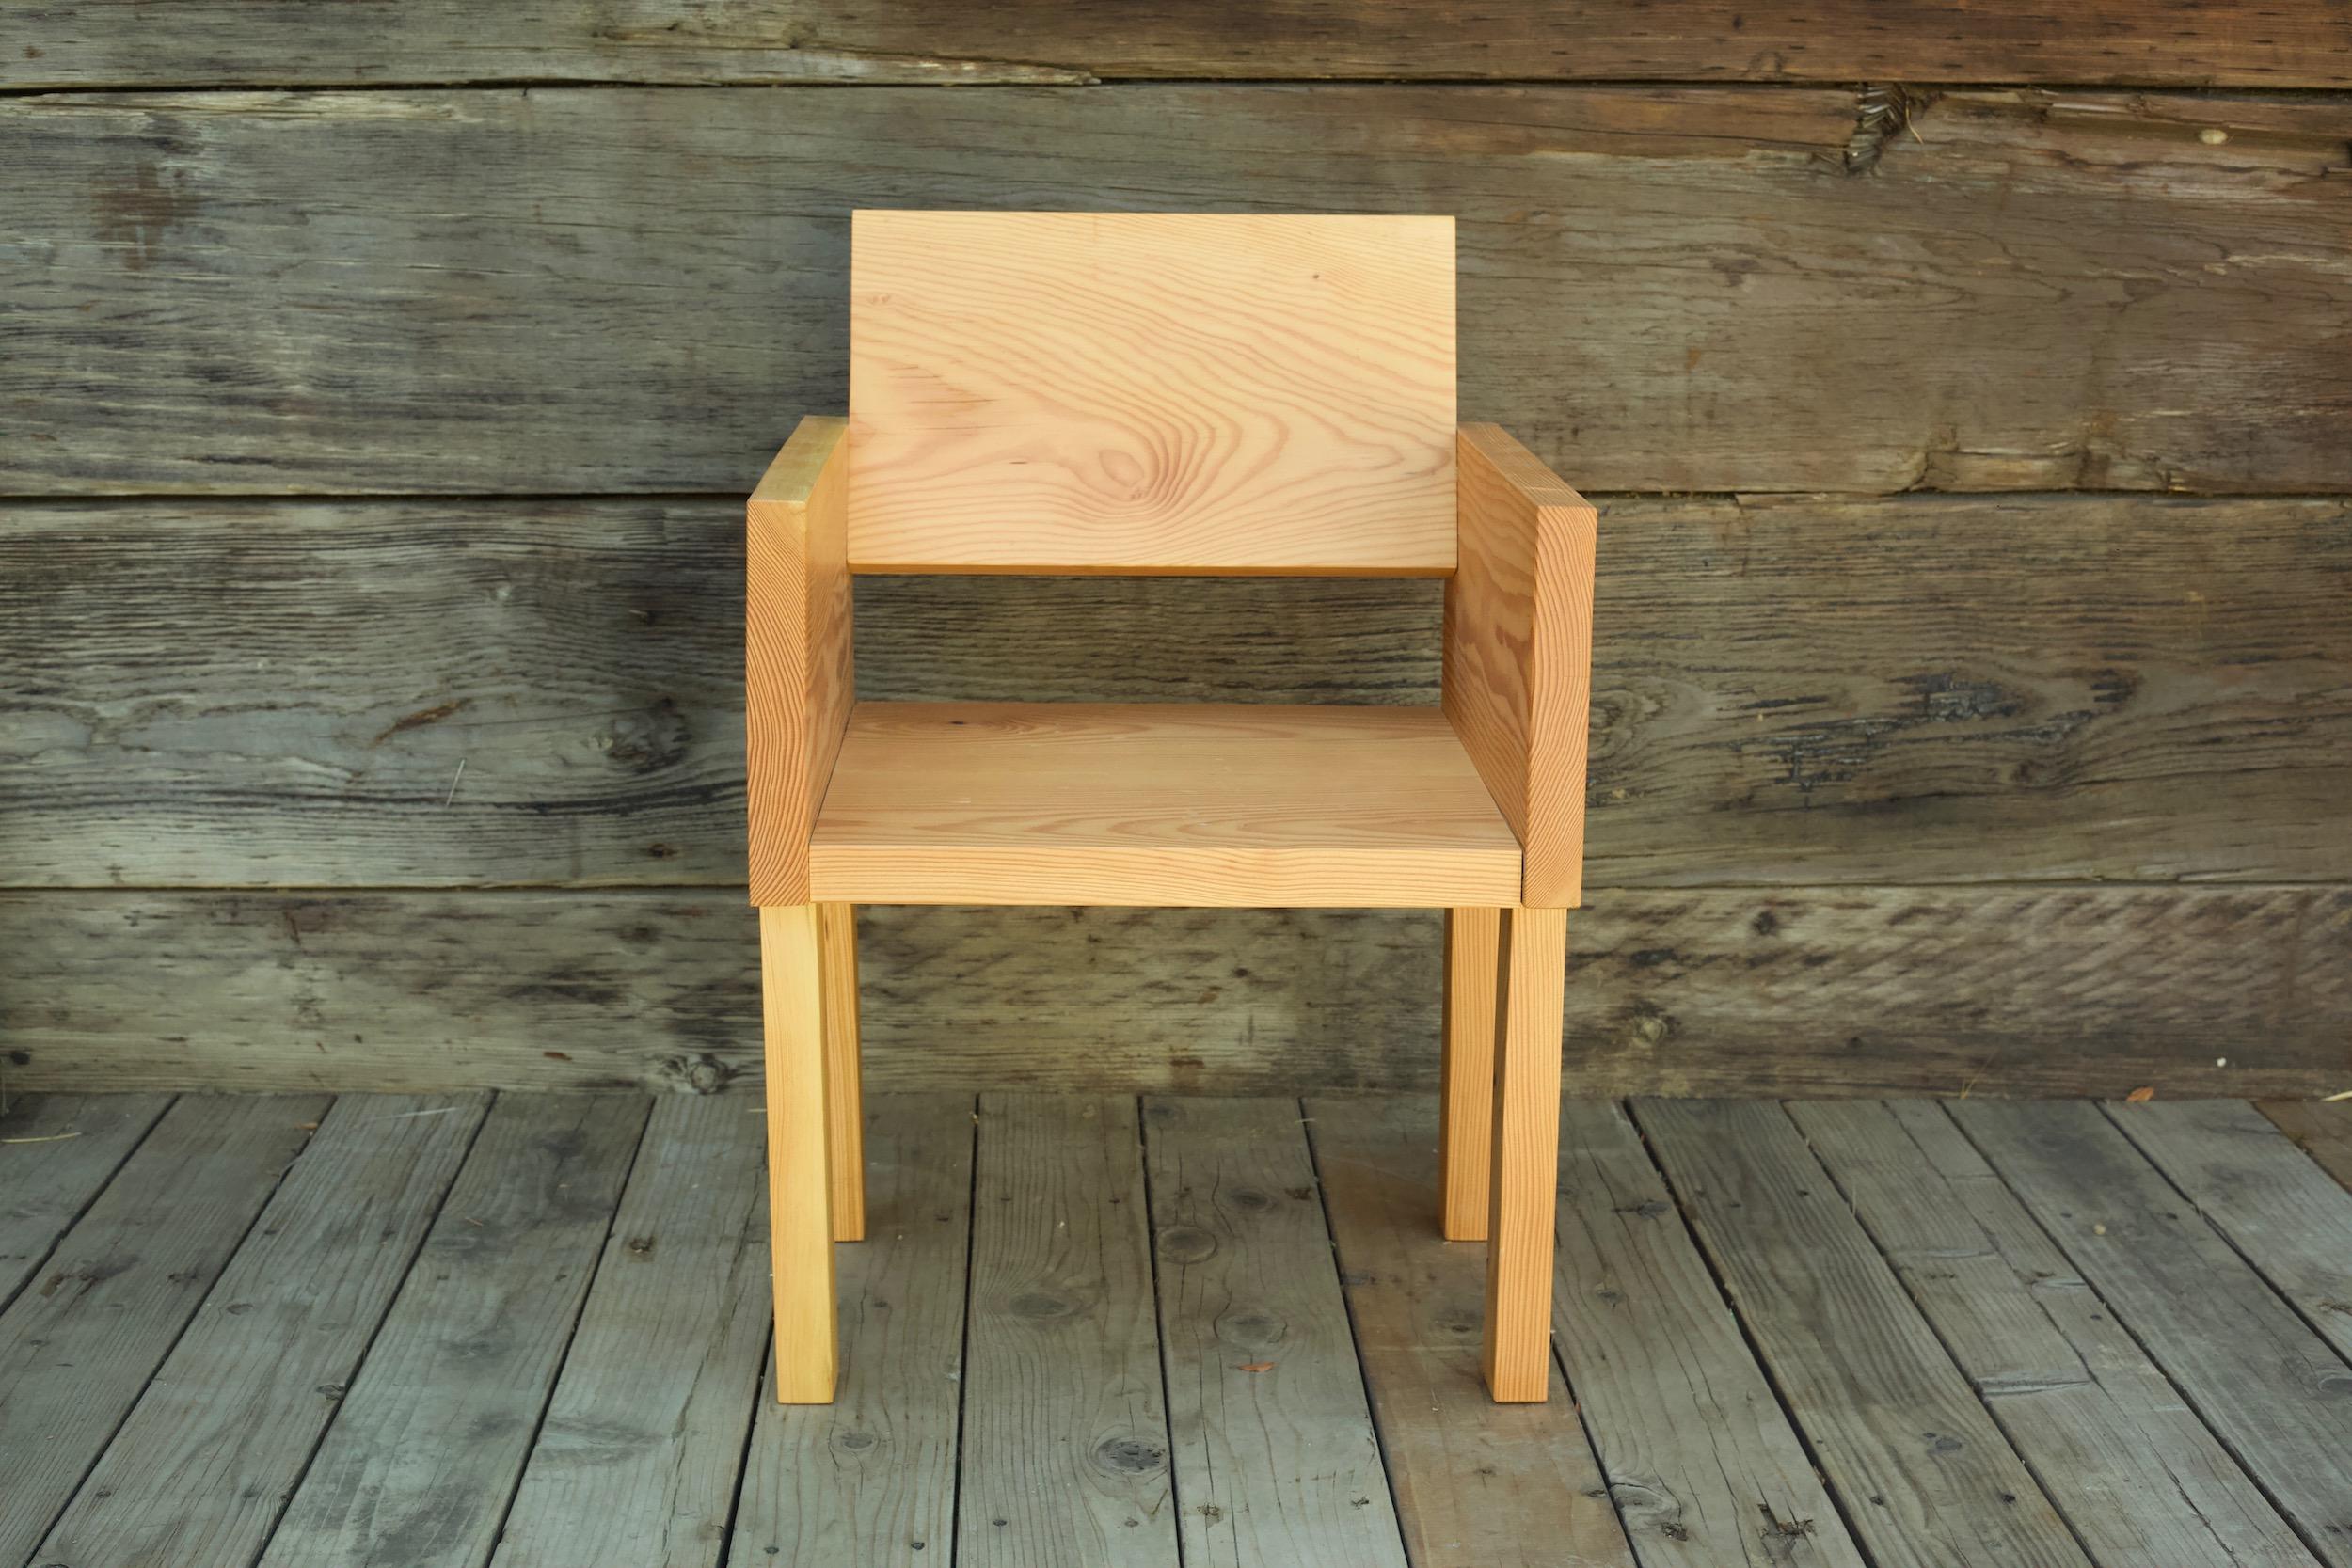 squarechair3.jpeg